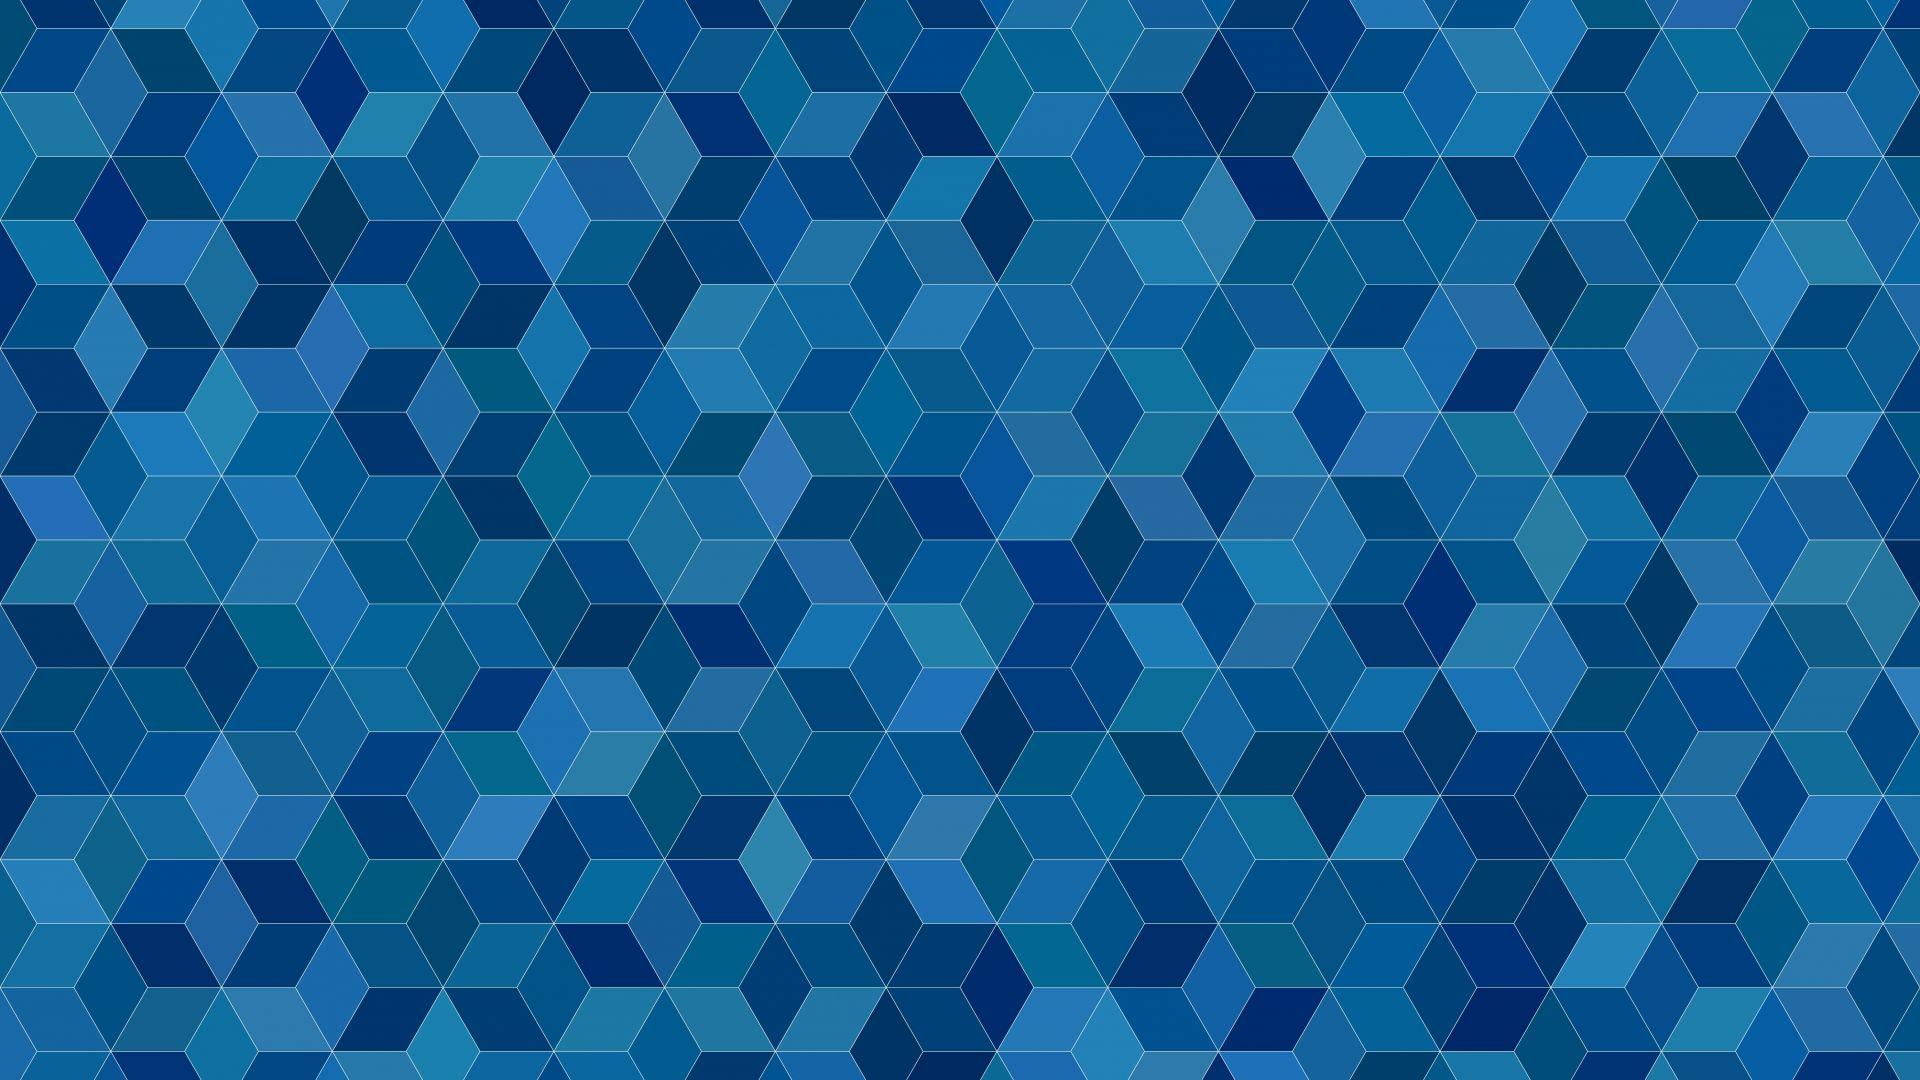 Blue Cubes Abstract Pattern 4k 5k Wallpaper